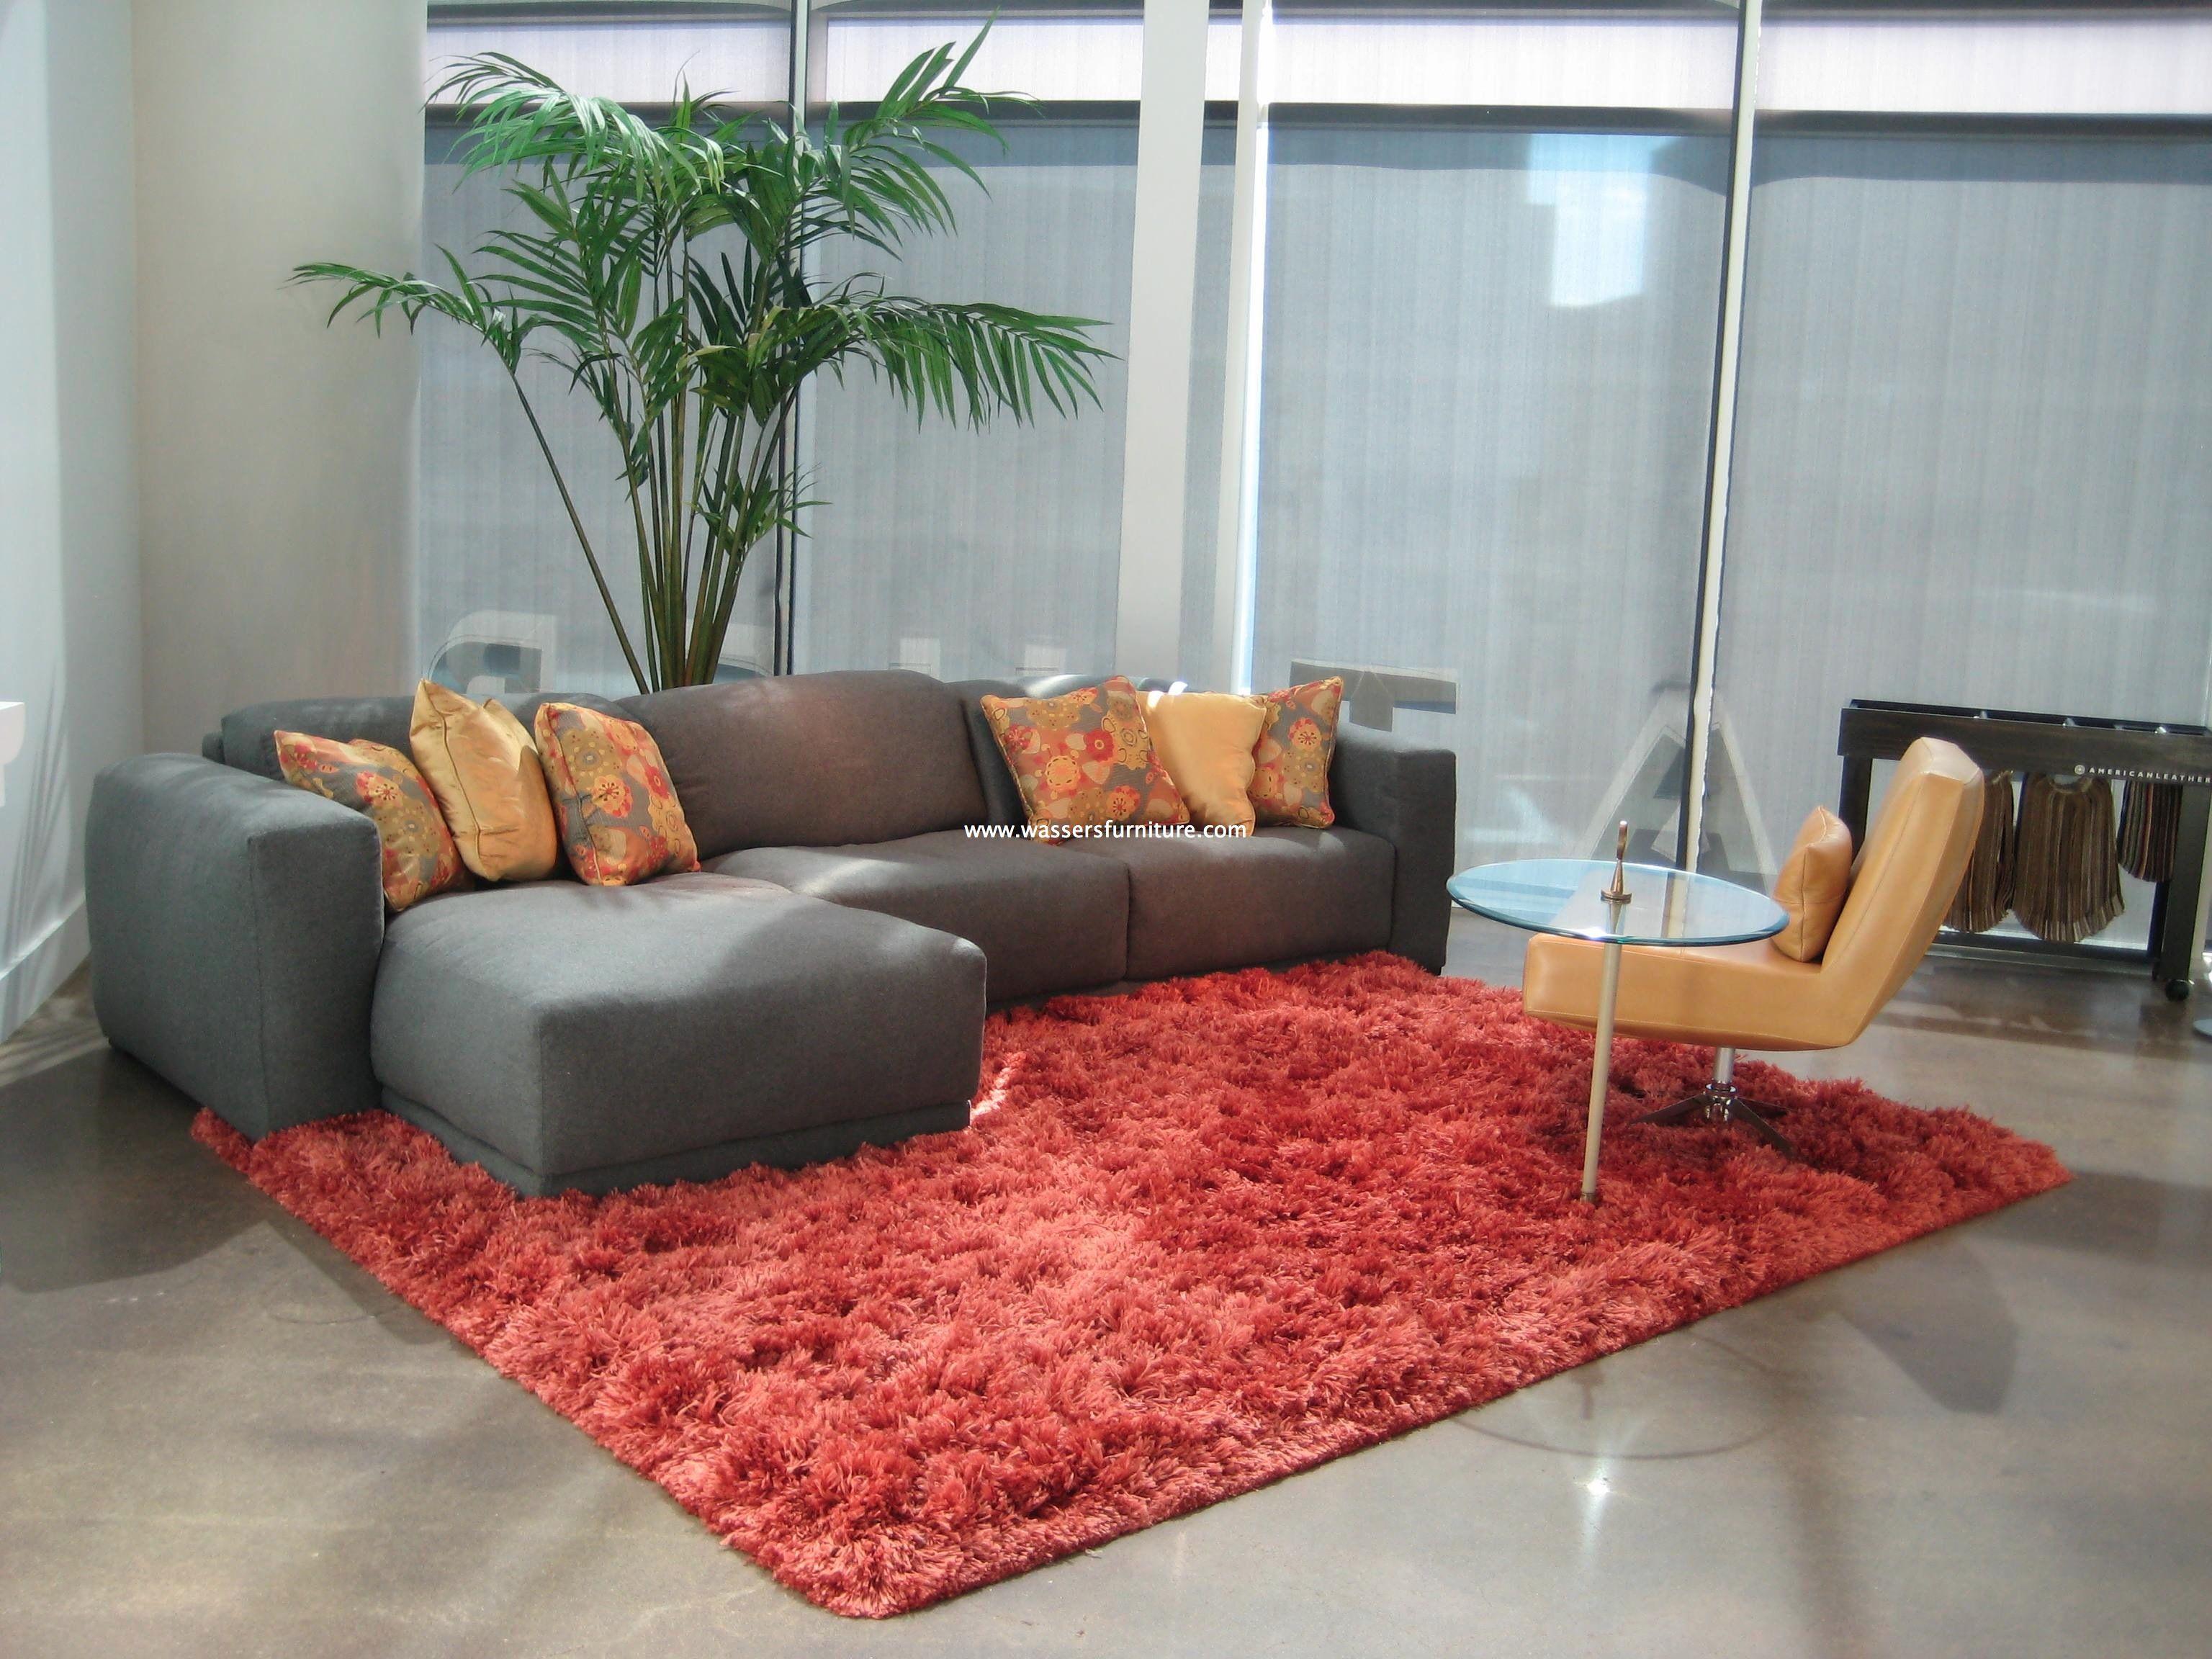 Wassers furniture modern contemporary furniture showroom and interior design studio hallandale beach aventura fl www wassersfurniture com 954 454 9500